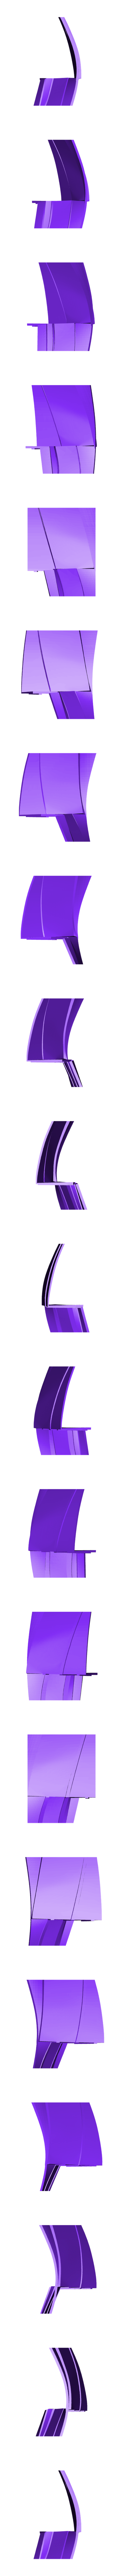 Part_16_v2.stl Download free STL file Battlestar Galactica Colonial Viper Pilot Helmet • 3D printing object, VillainousPropShop